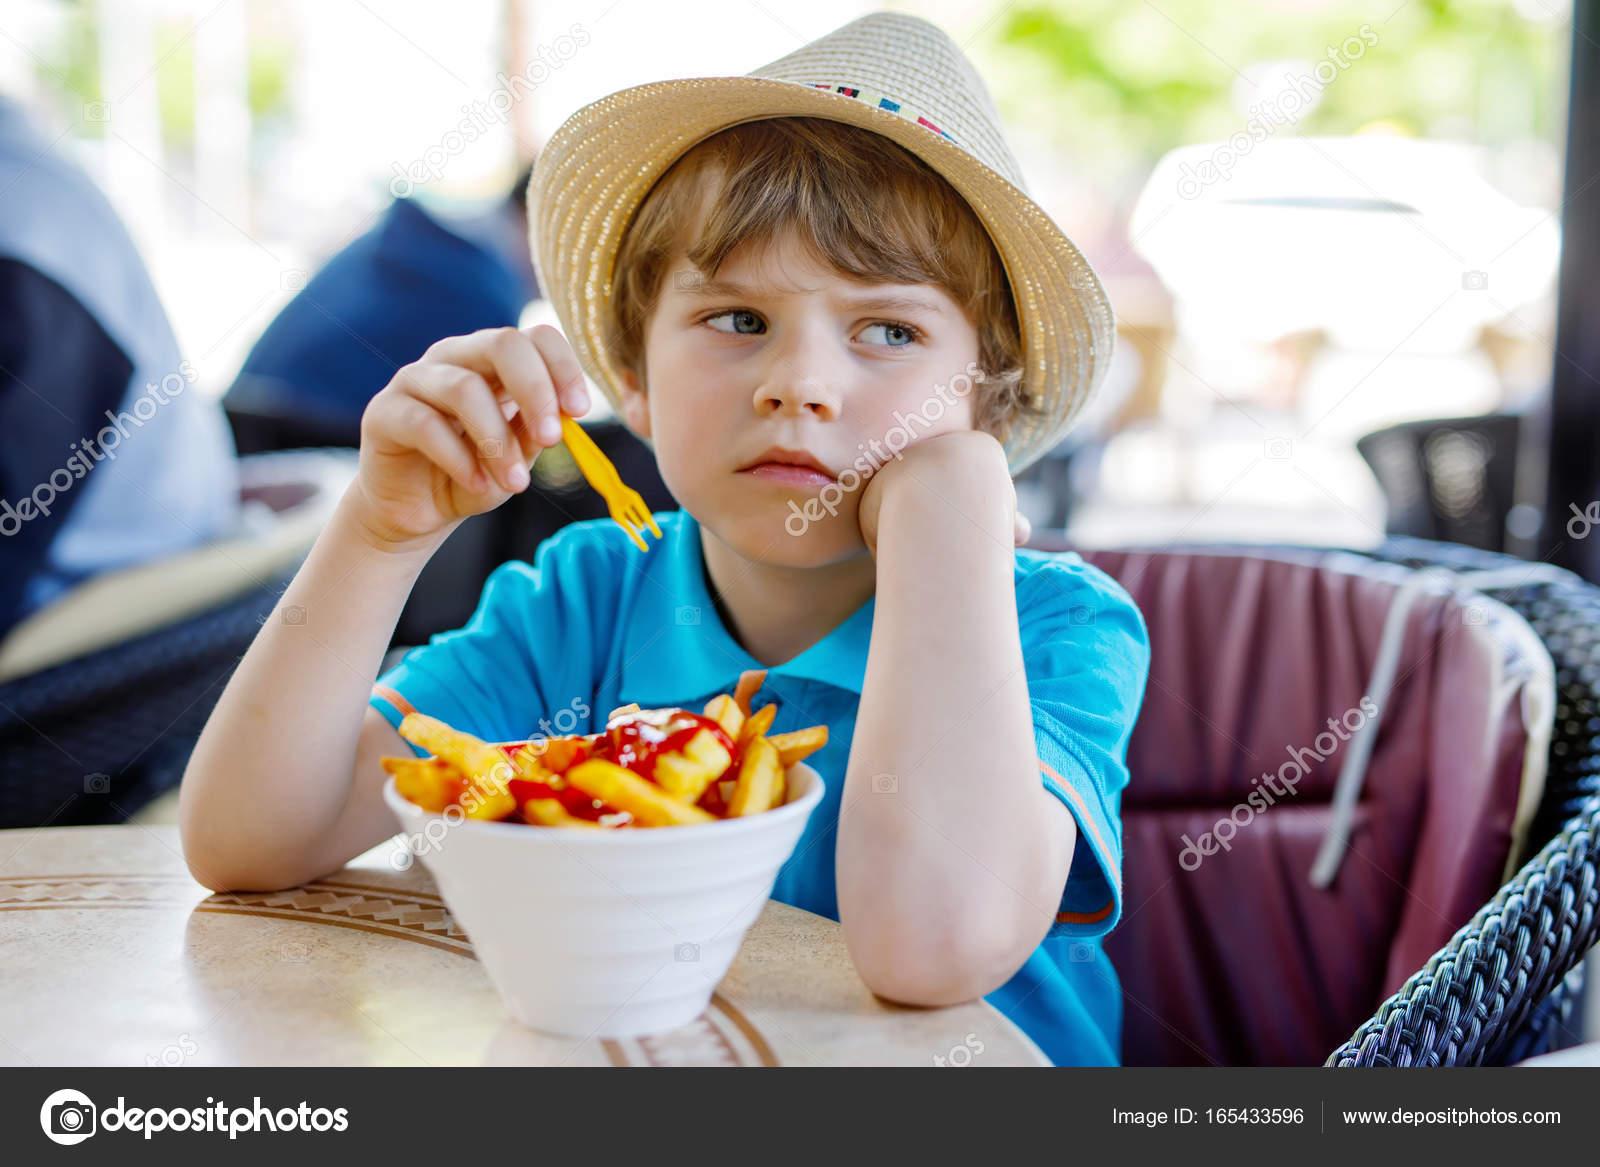 Cute Healthy Preschool Kid Boy Eats French Fries Potatoes